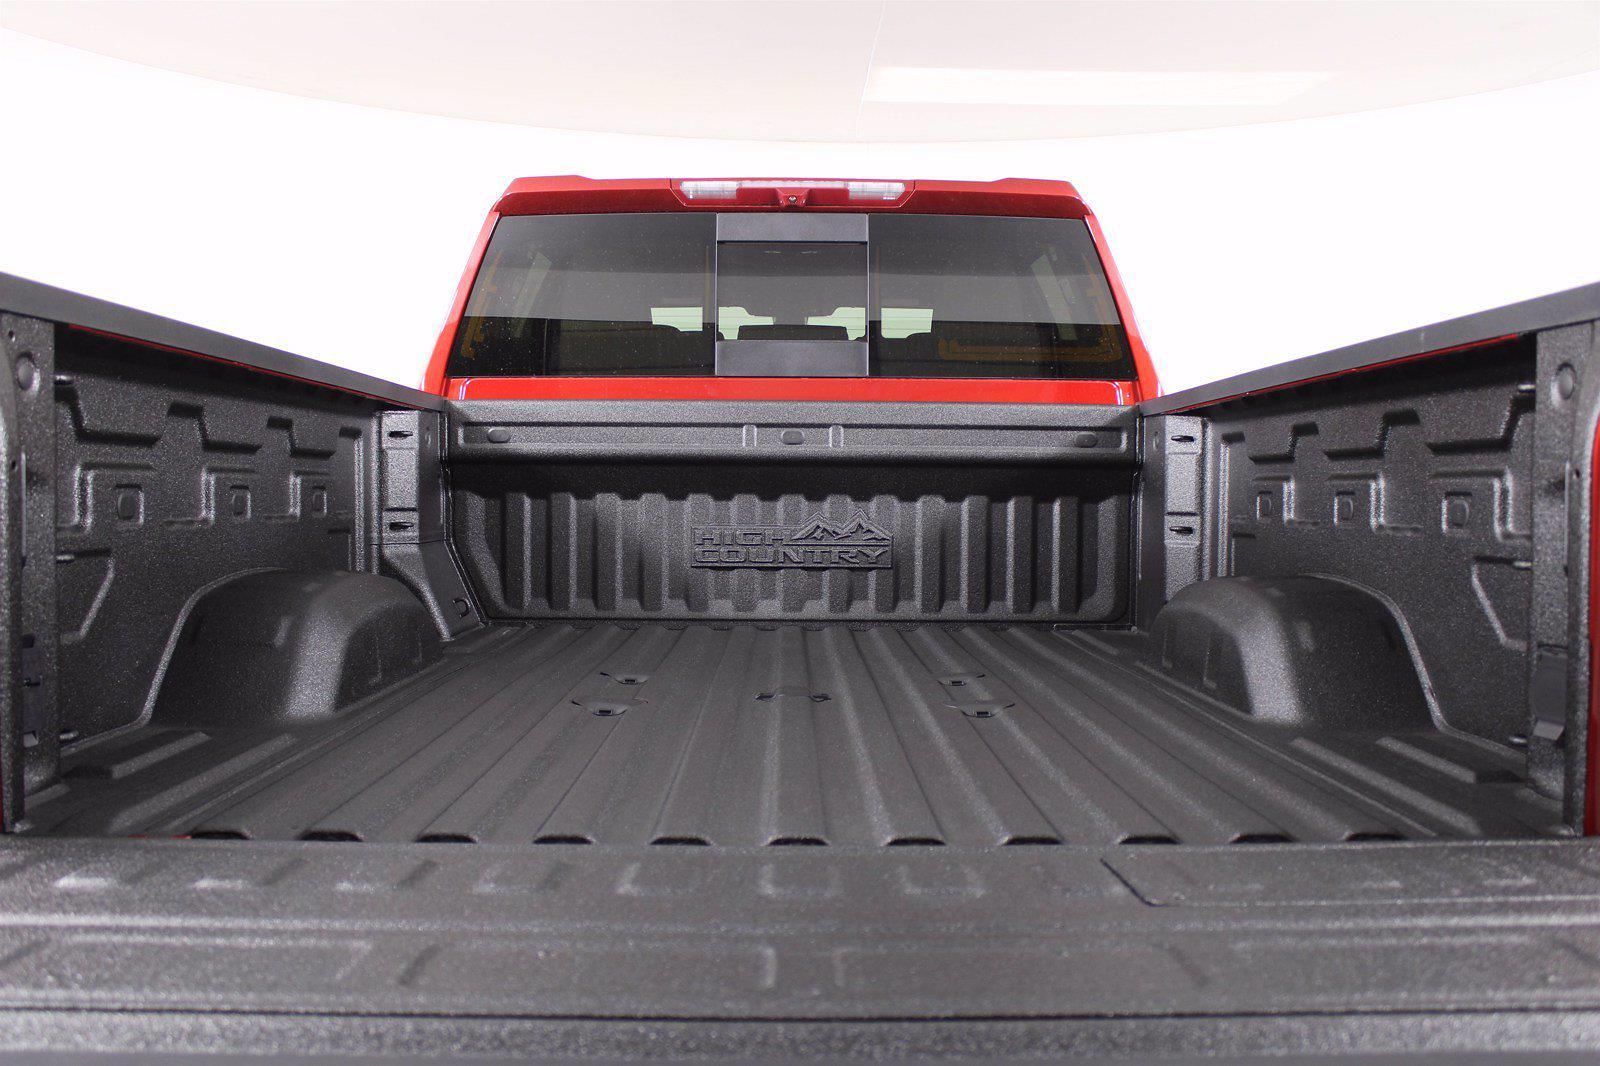 2021 Chevrolet Silverado 3500 Crew Cab 4x4, Pickup #D111087 - photo 9